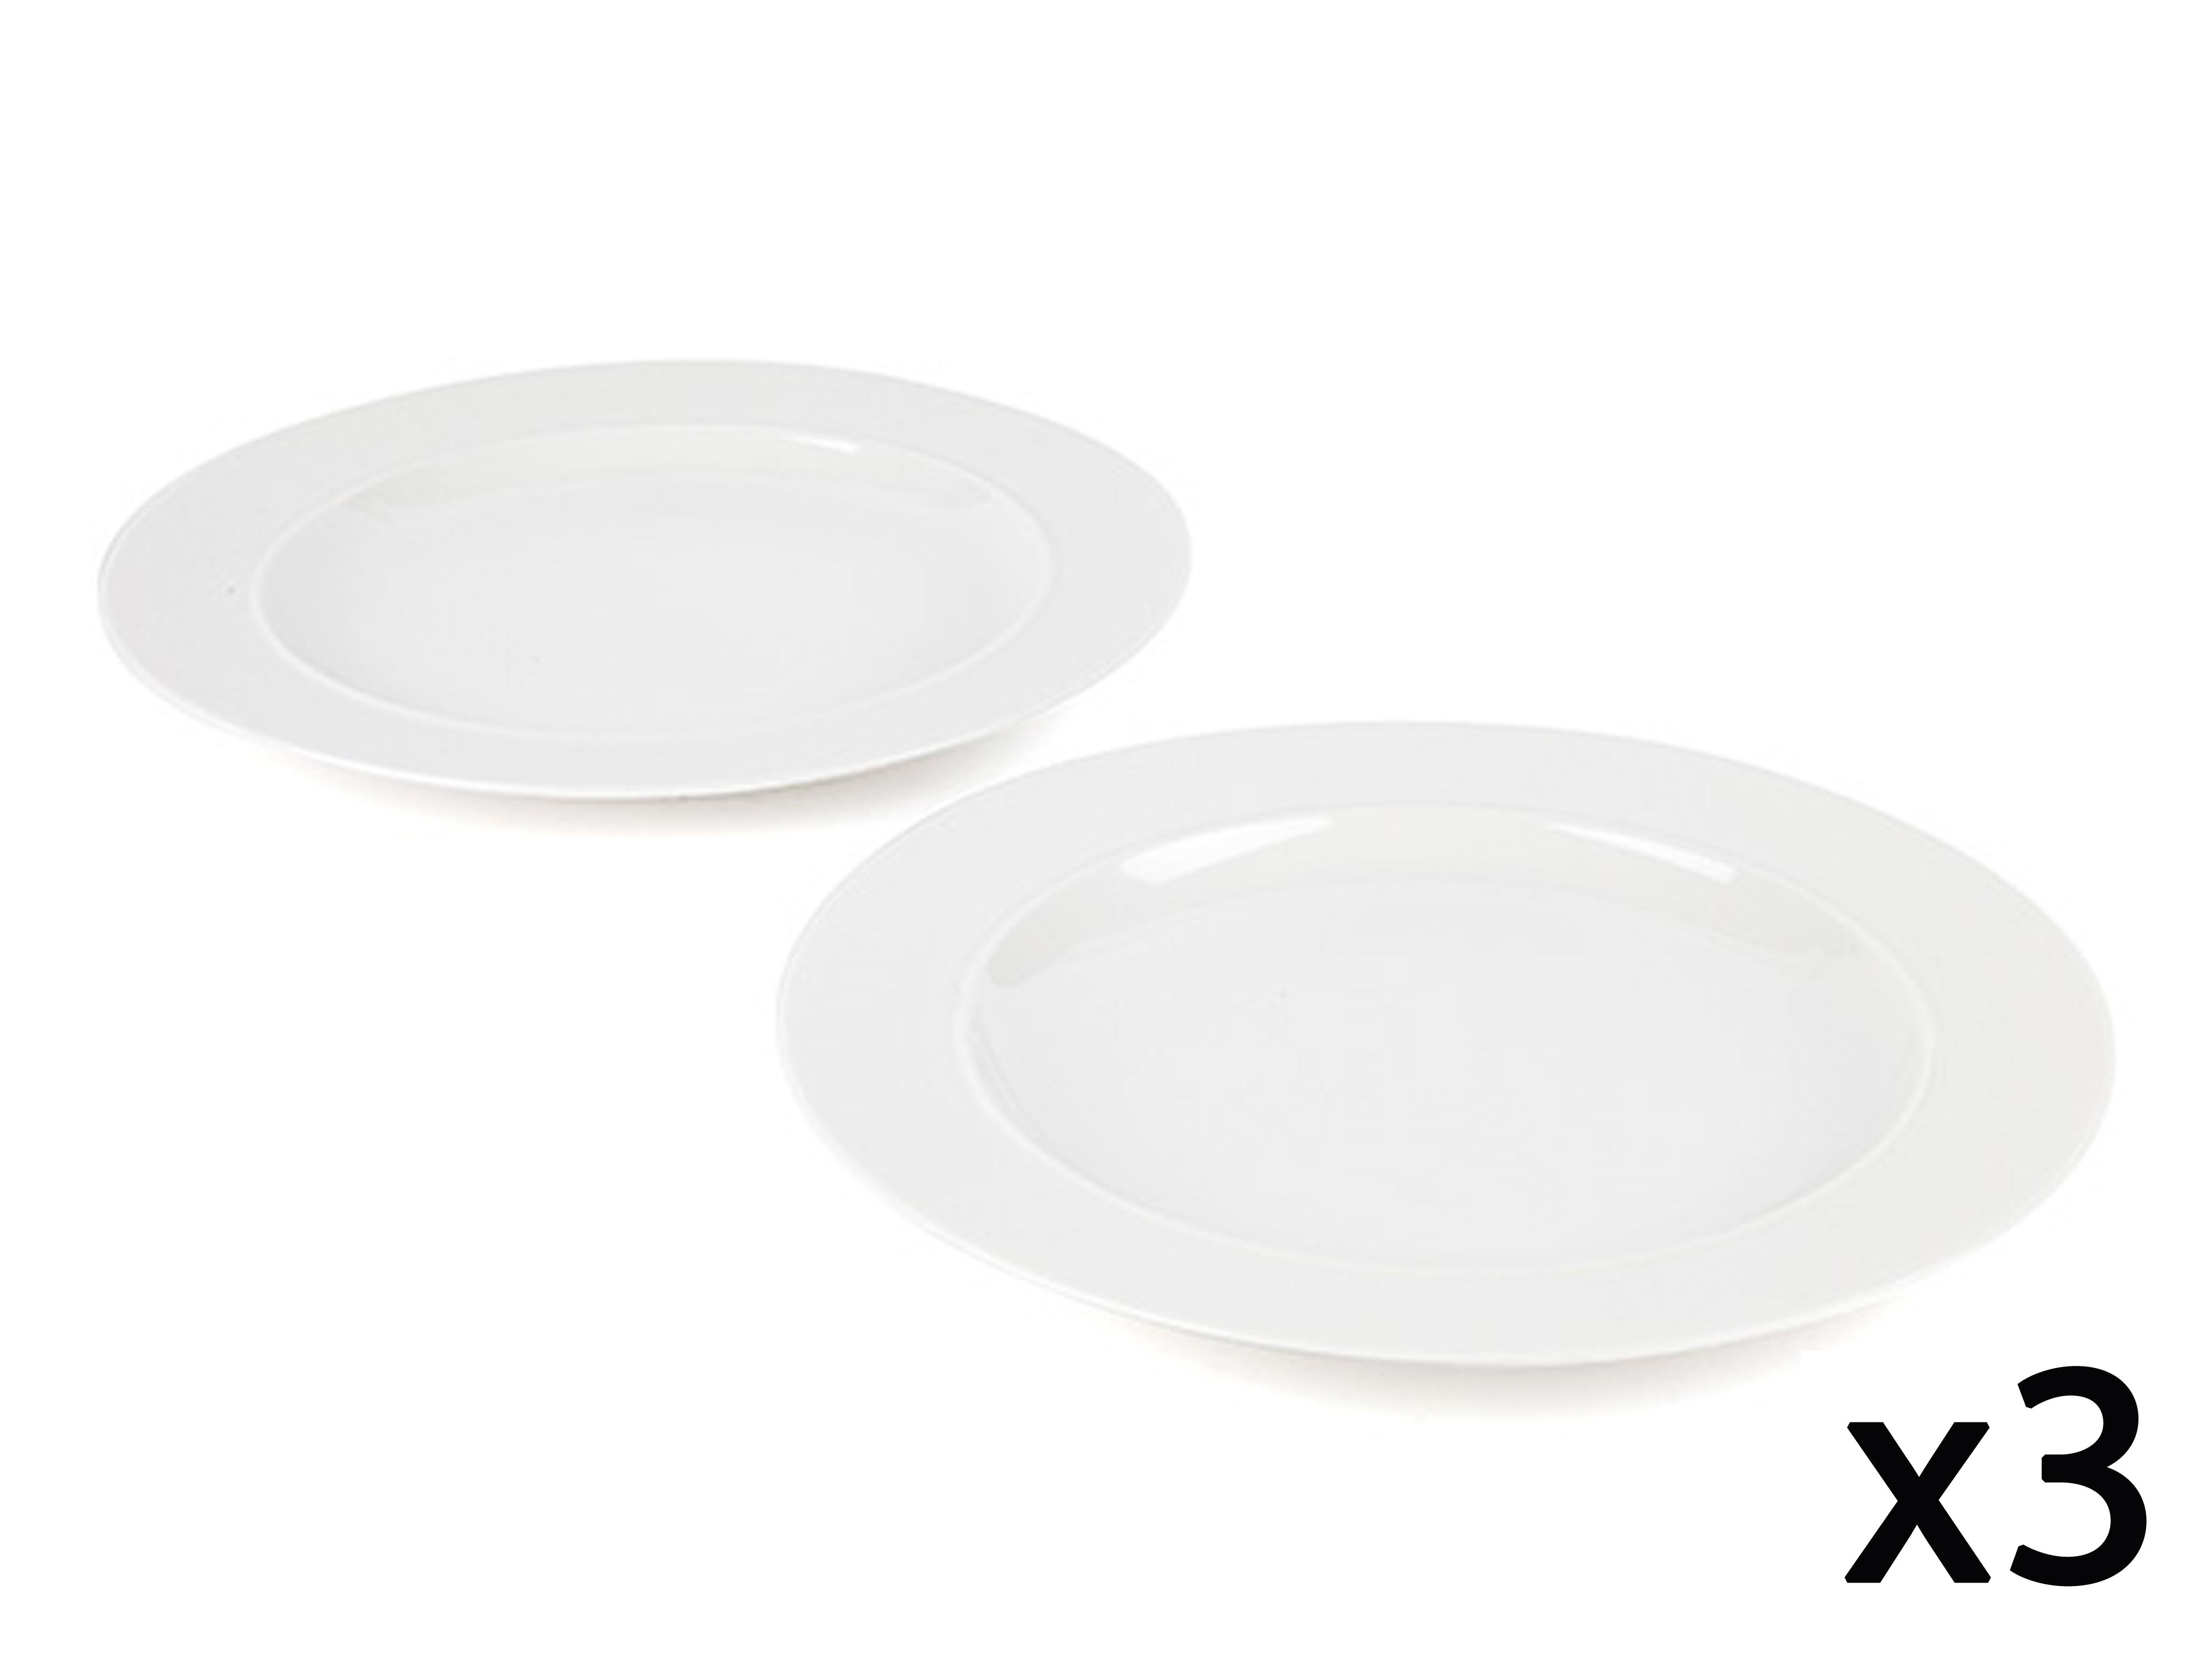 Alessi la bella tavola porcelain dinner plates in gift box - Alessi la bella tavola ...